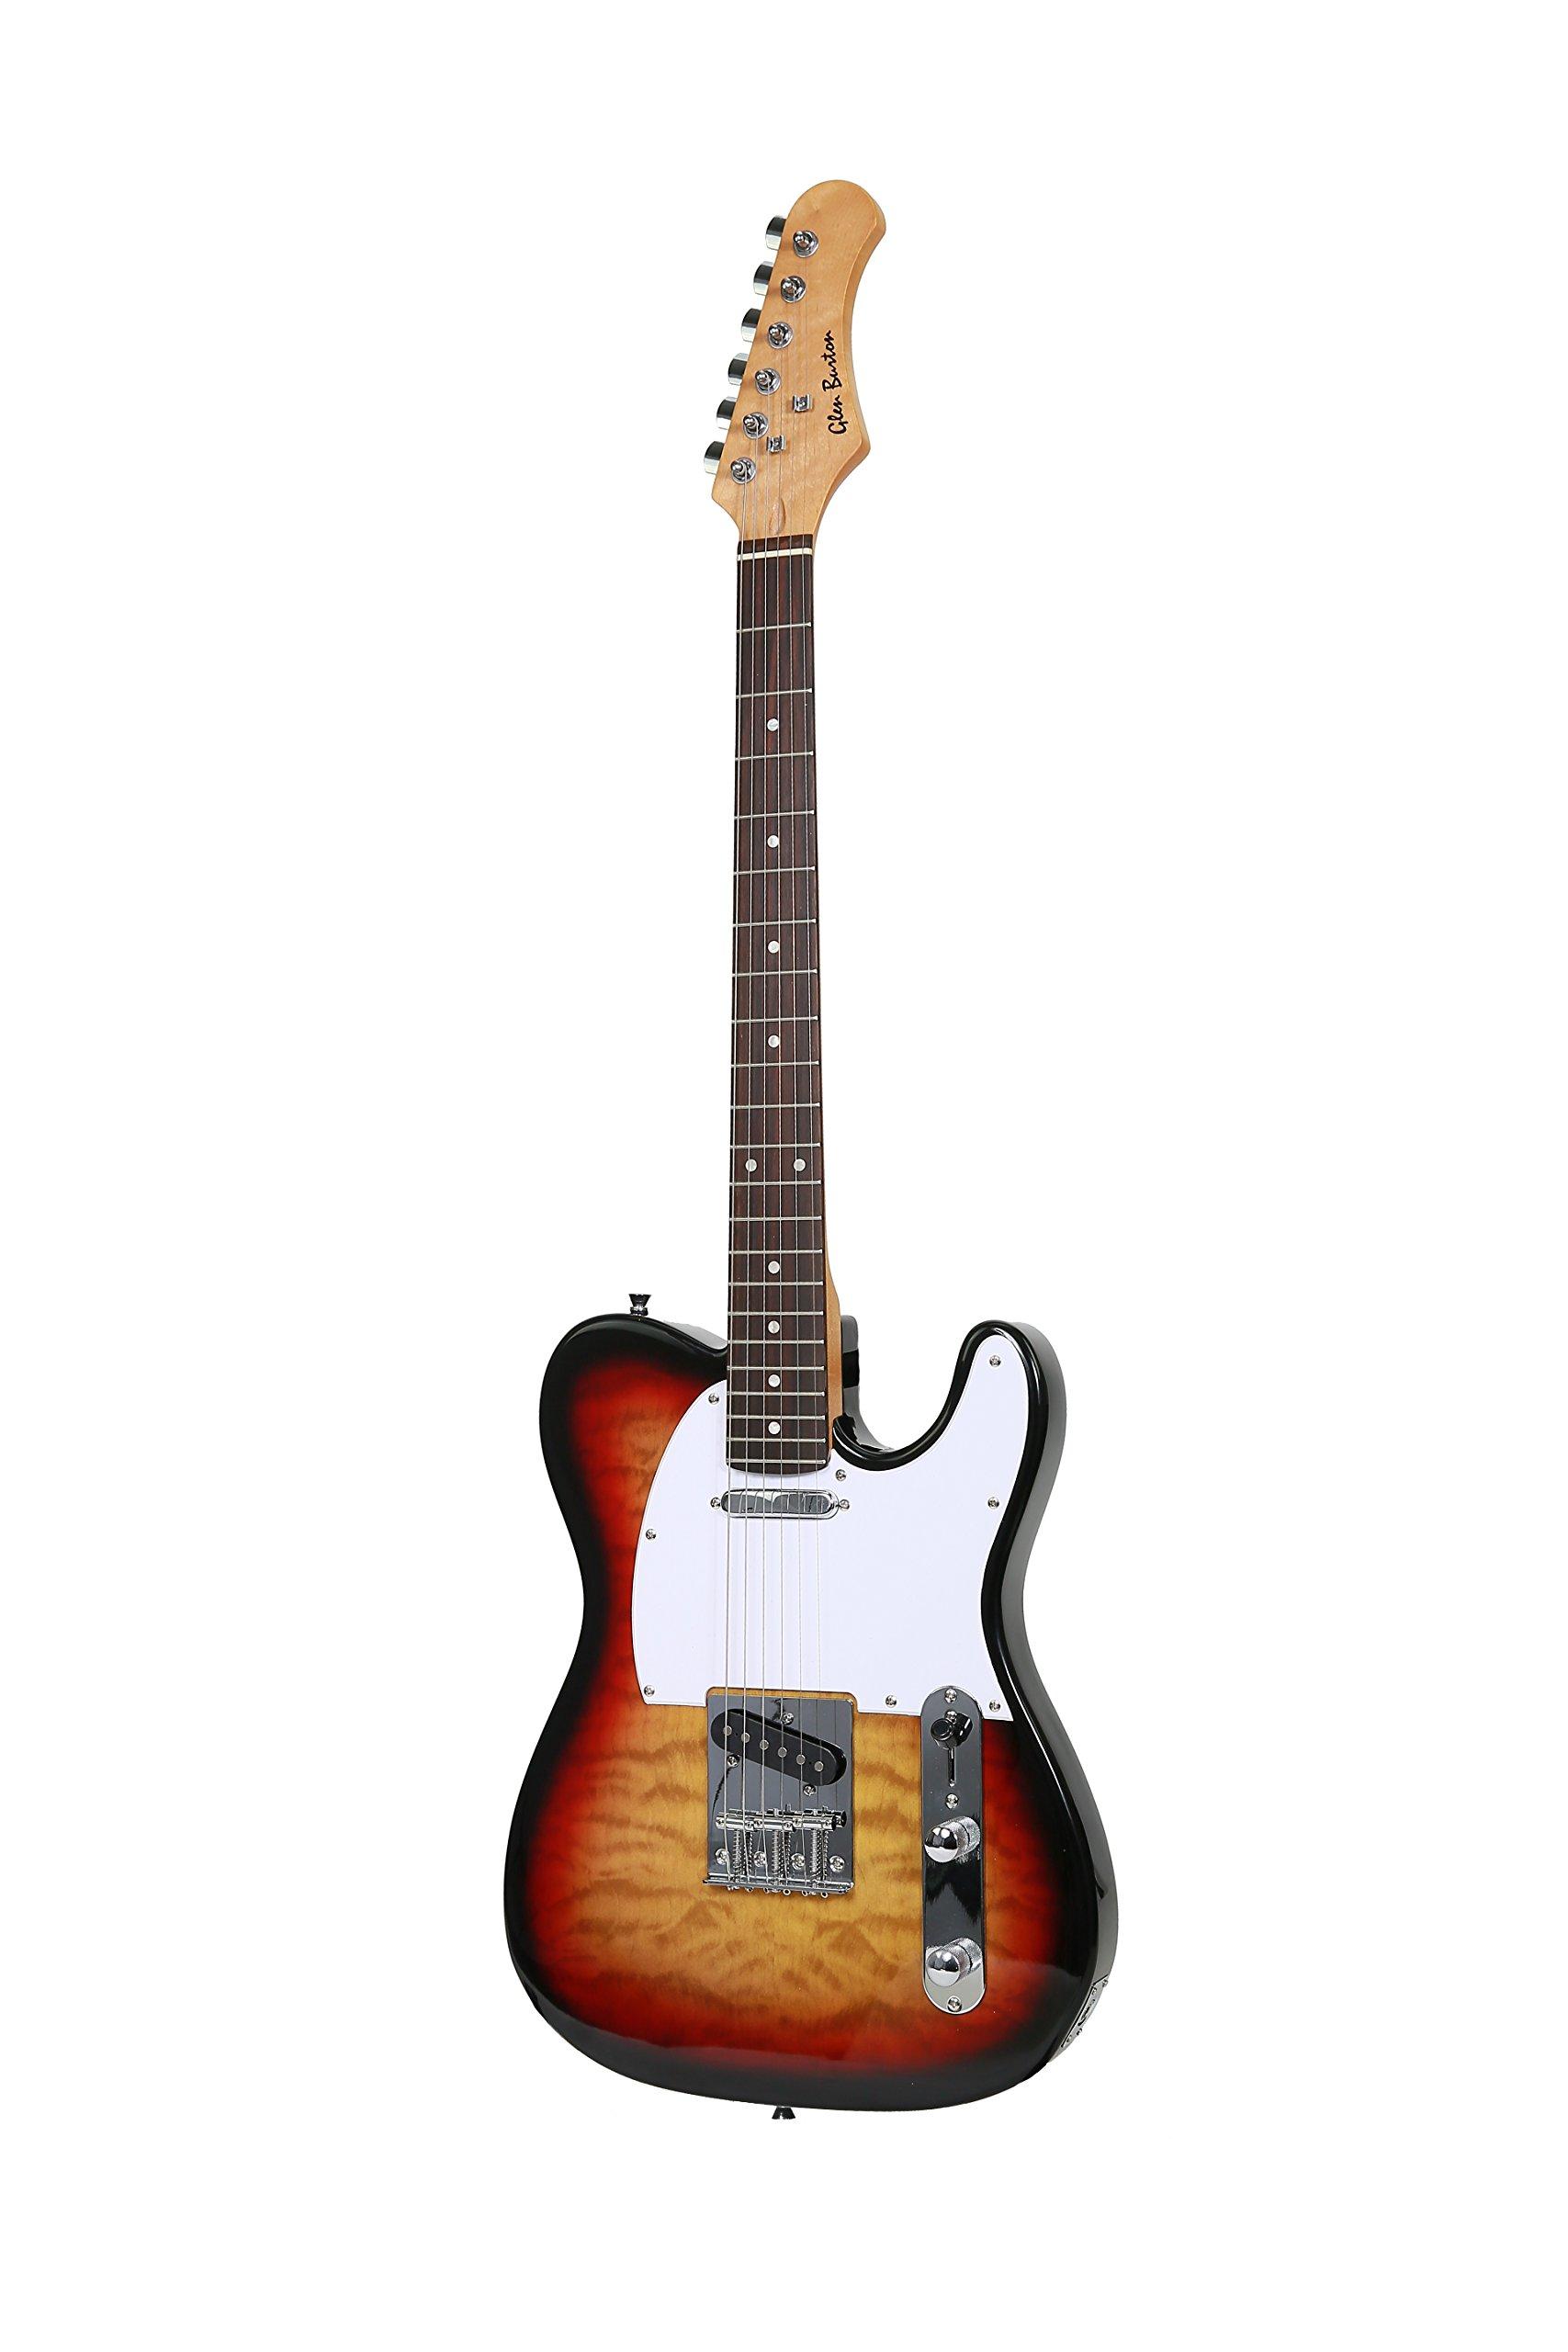 Cheap Glen Burton GE39-TLQ303-TS X-Series TL Style Electric Guitar Black Friday & Cyber Monday 2019